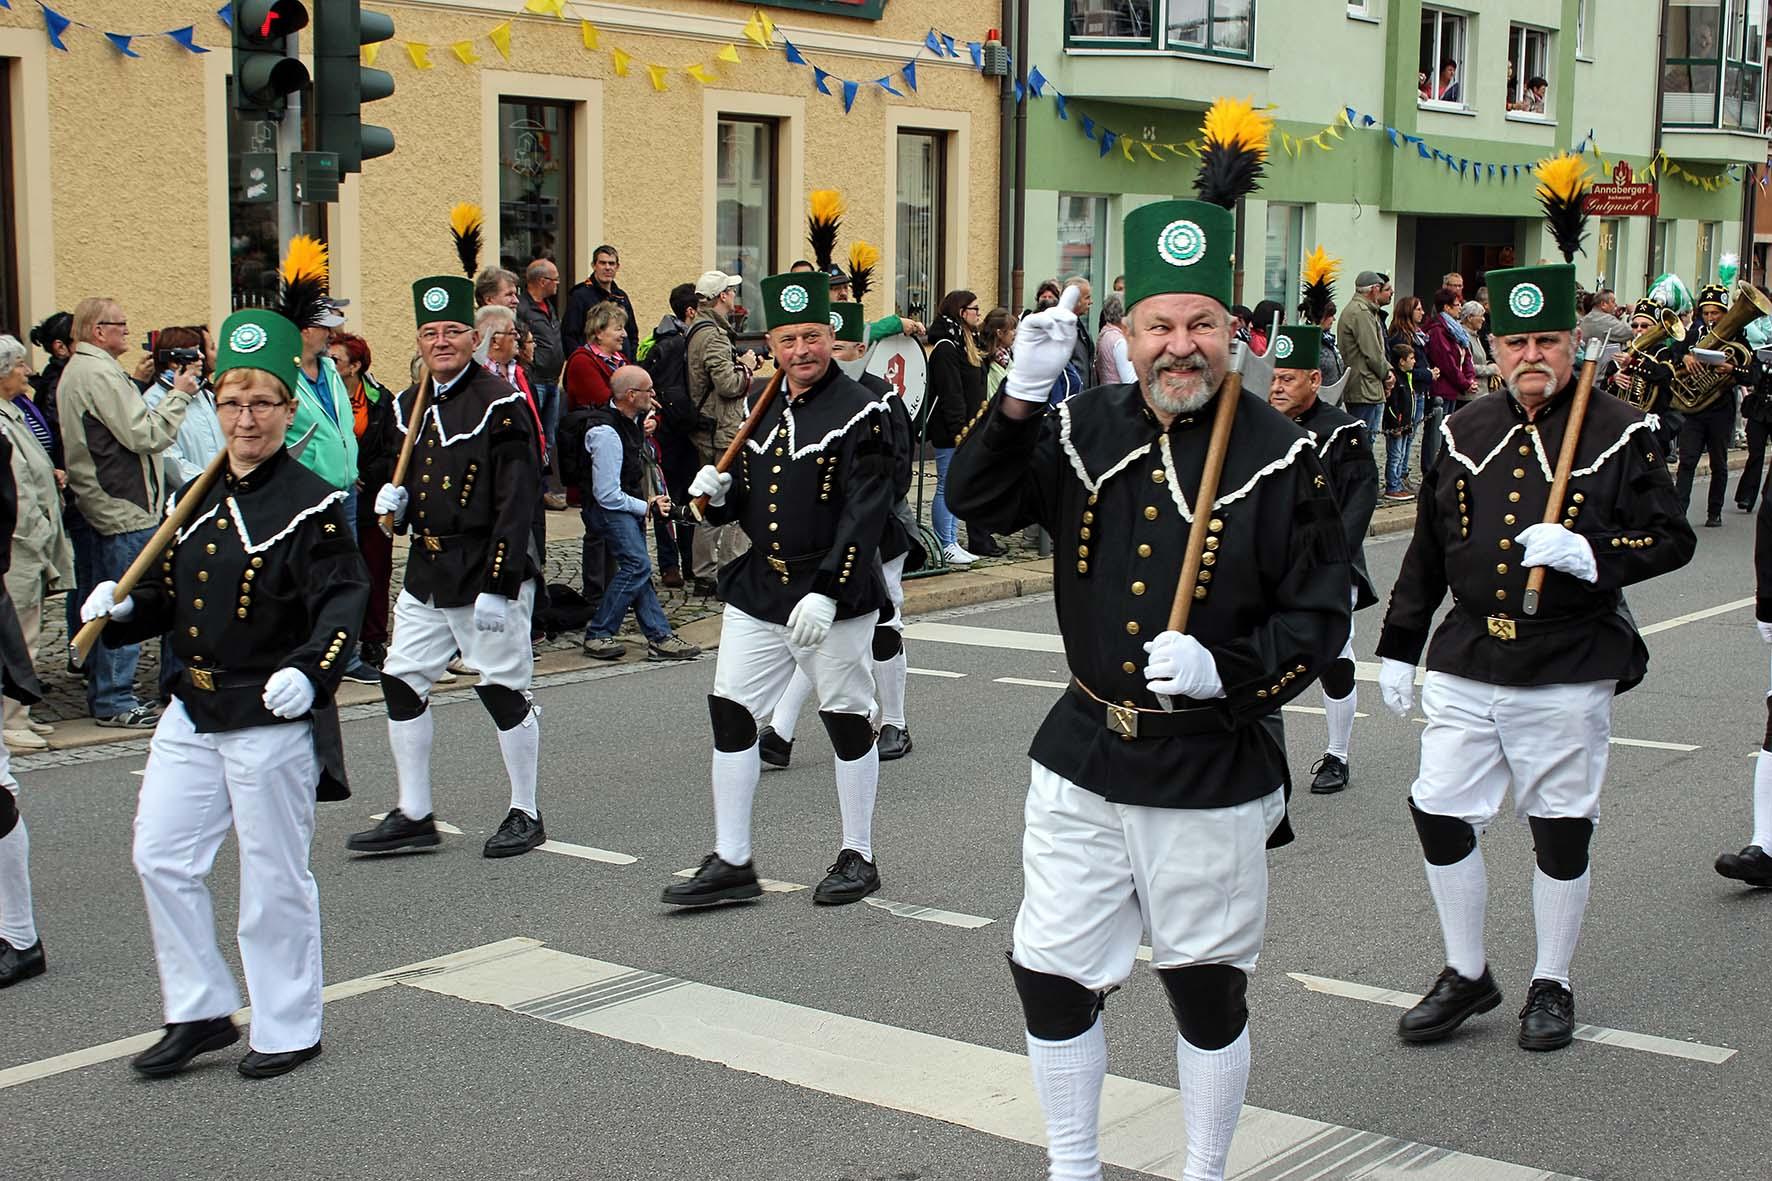 Großer Festumzug am 10. September in Ehrenfriedersdorf.